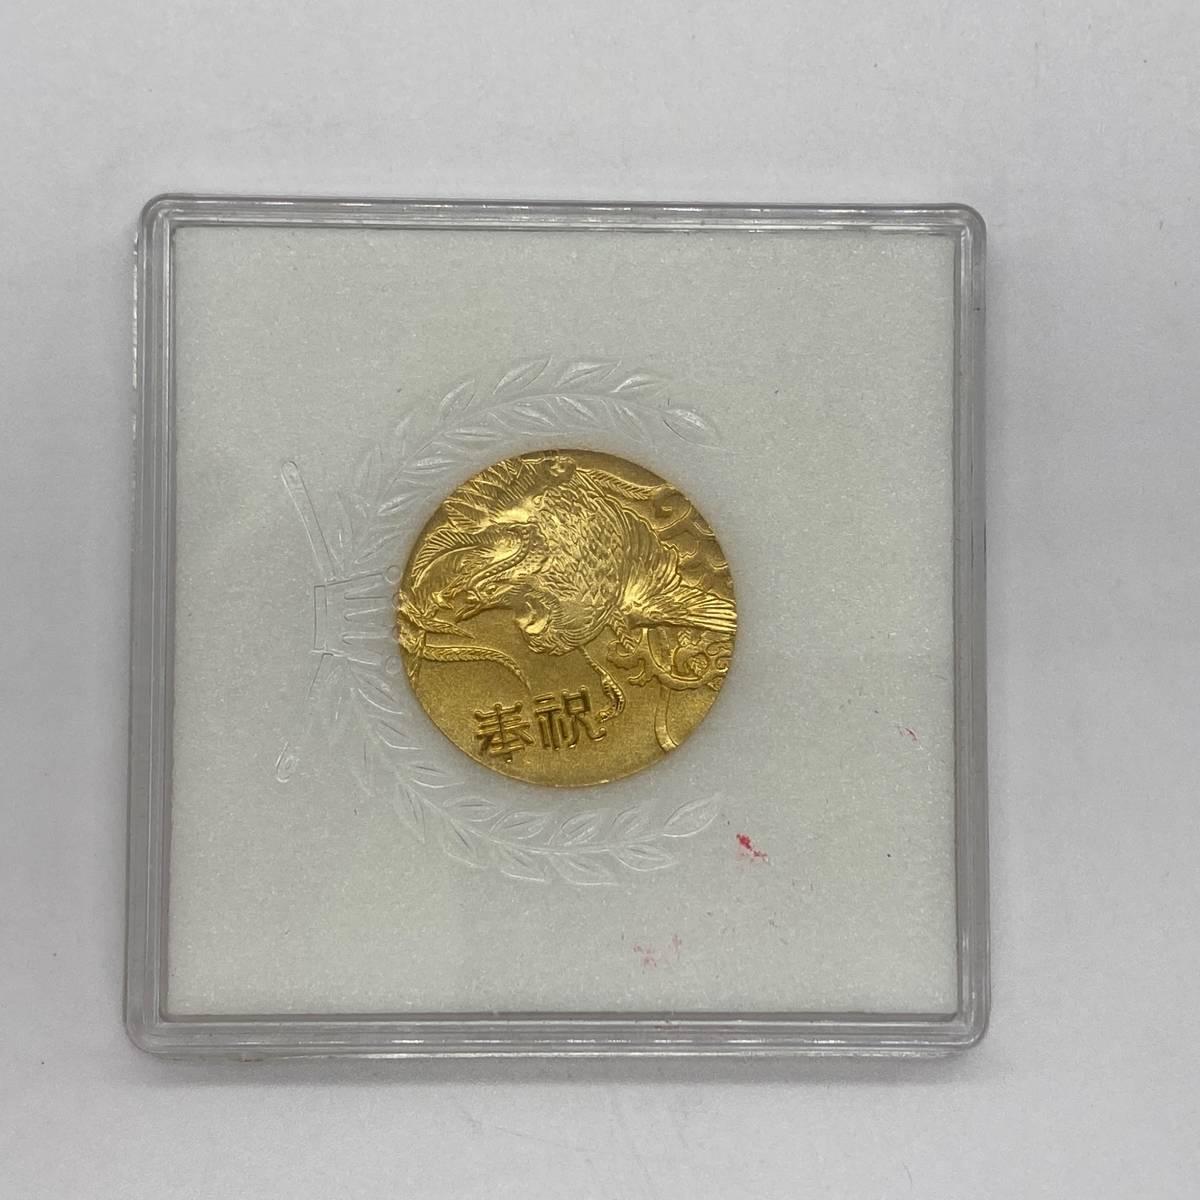 【1005】 天皇陛下喜寿 昭和53年 奉祝 記念メダル_画像3